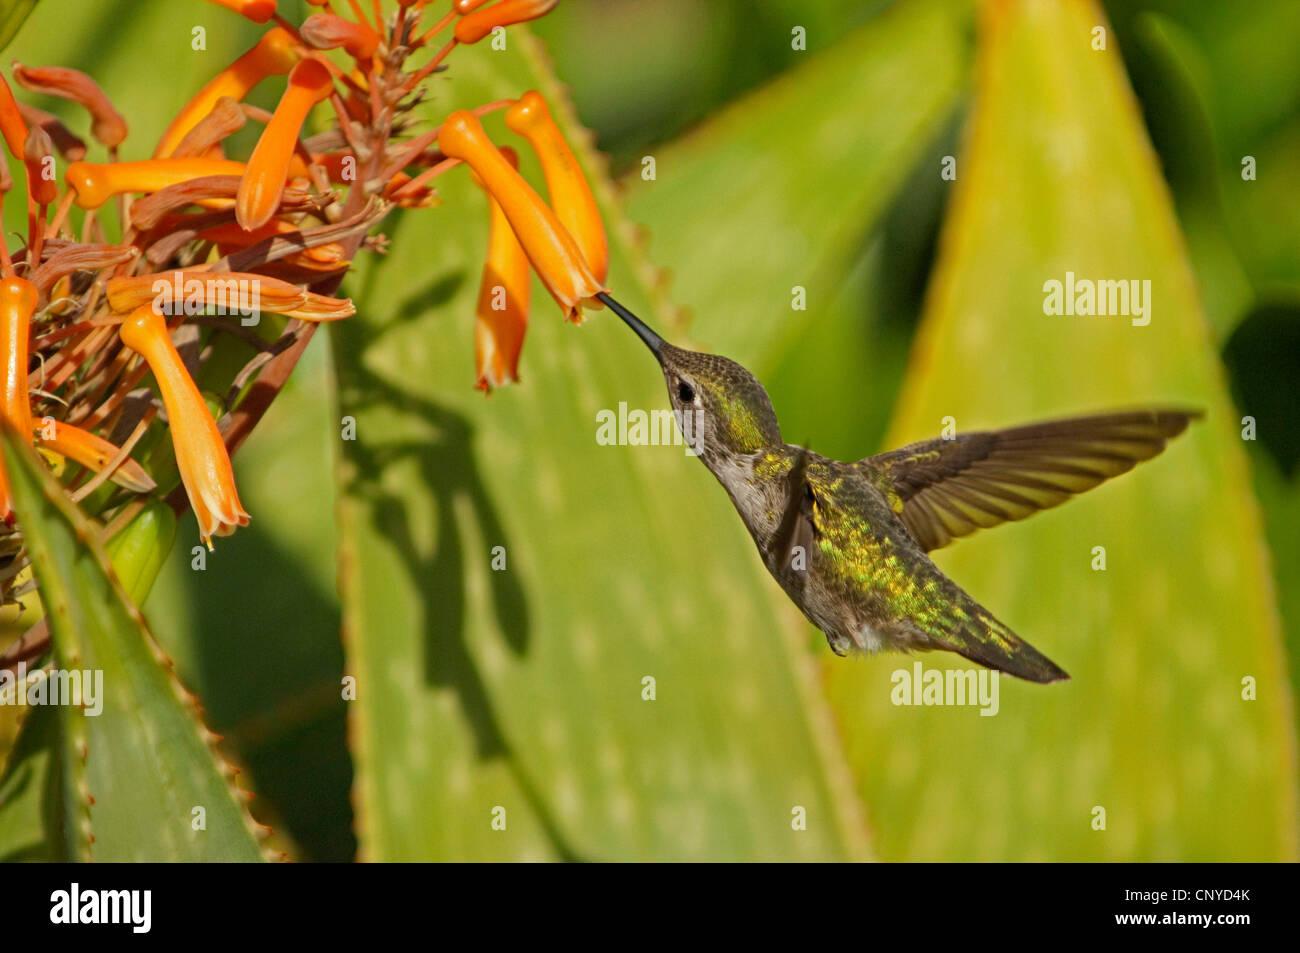 hummingbird feeding on nectar of an orange flower, USA, California - Stock Image